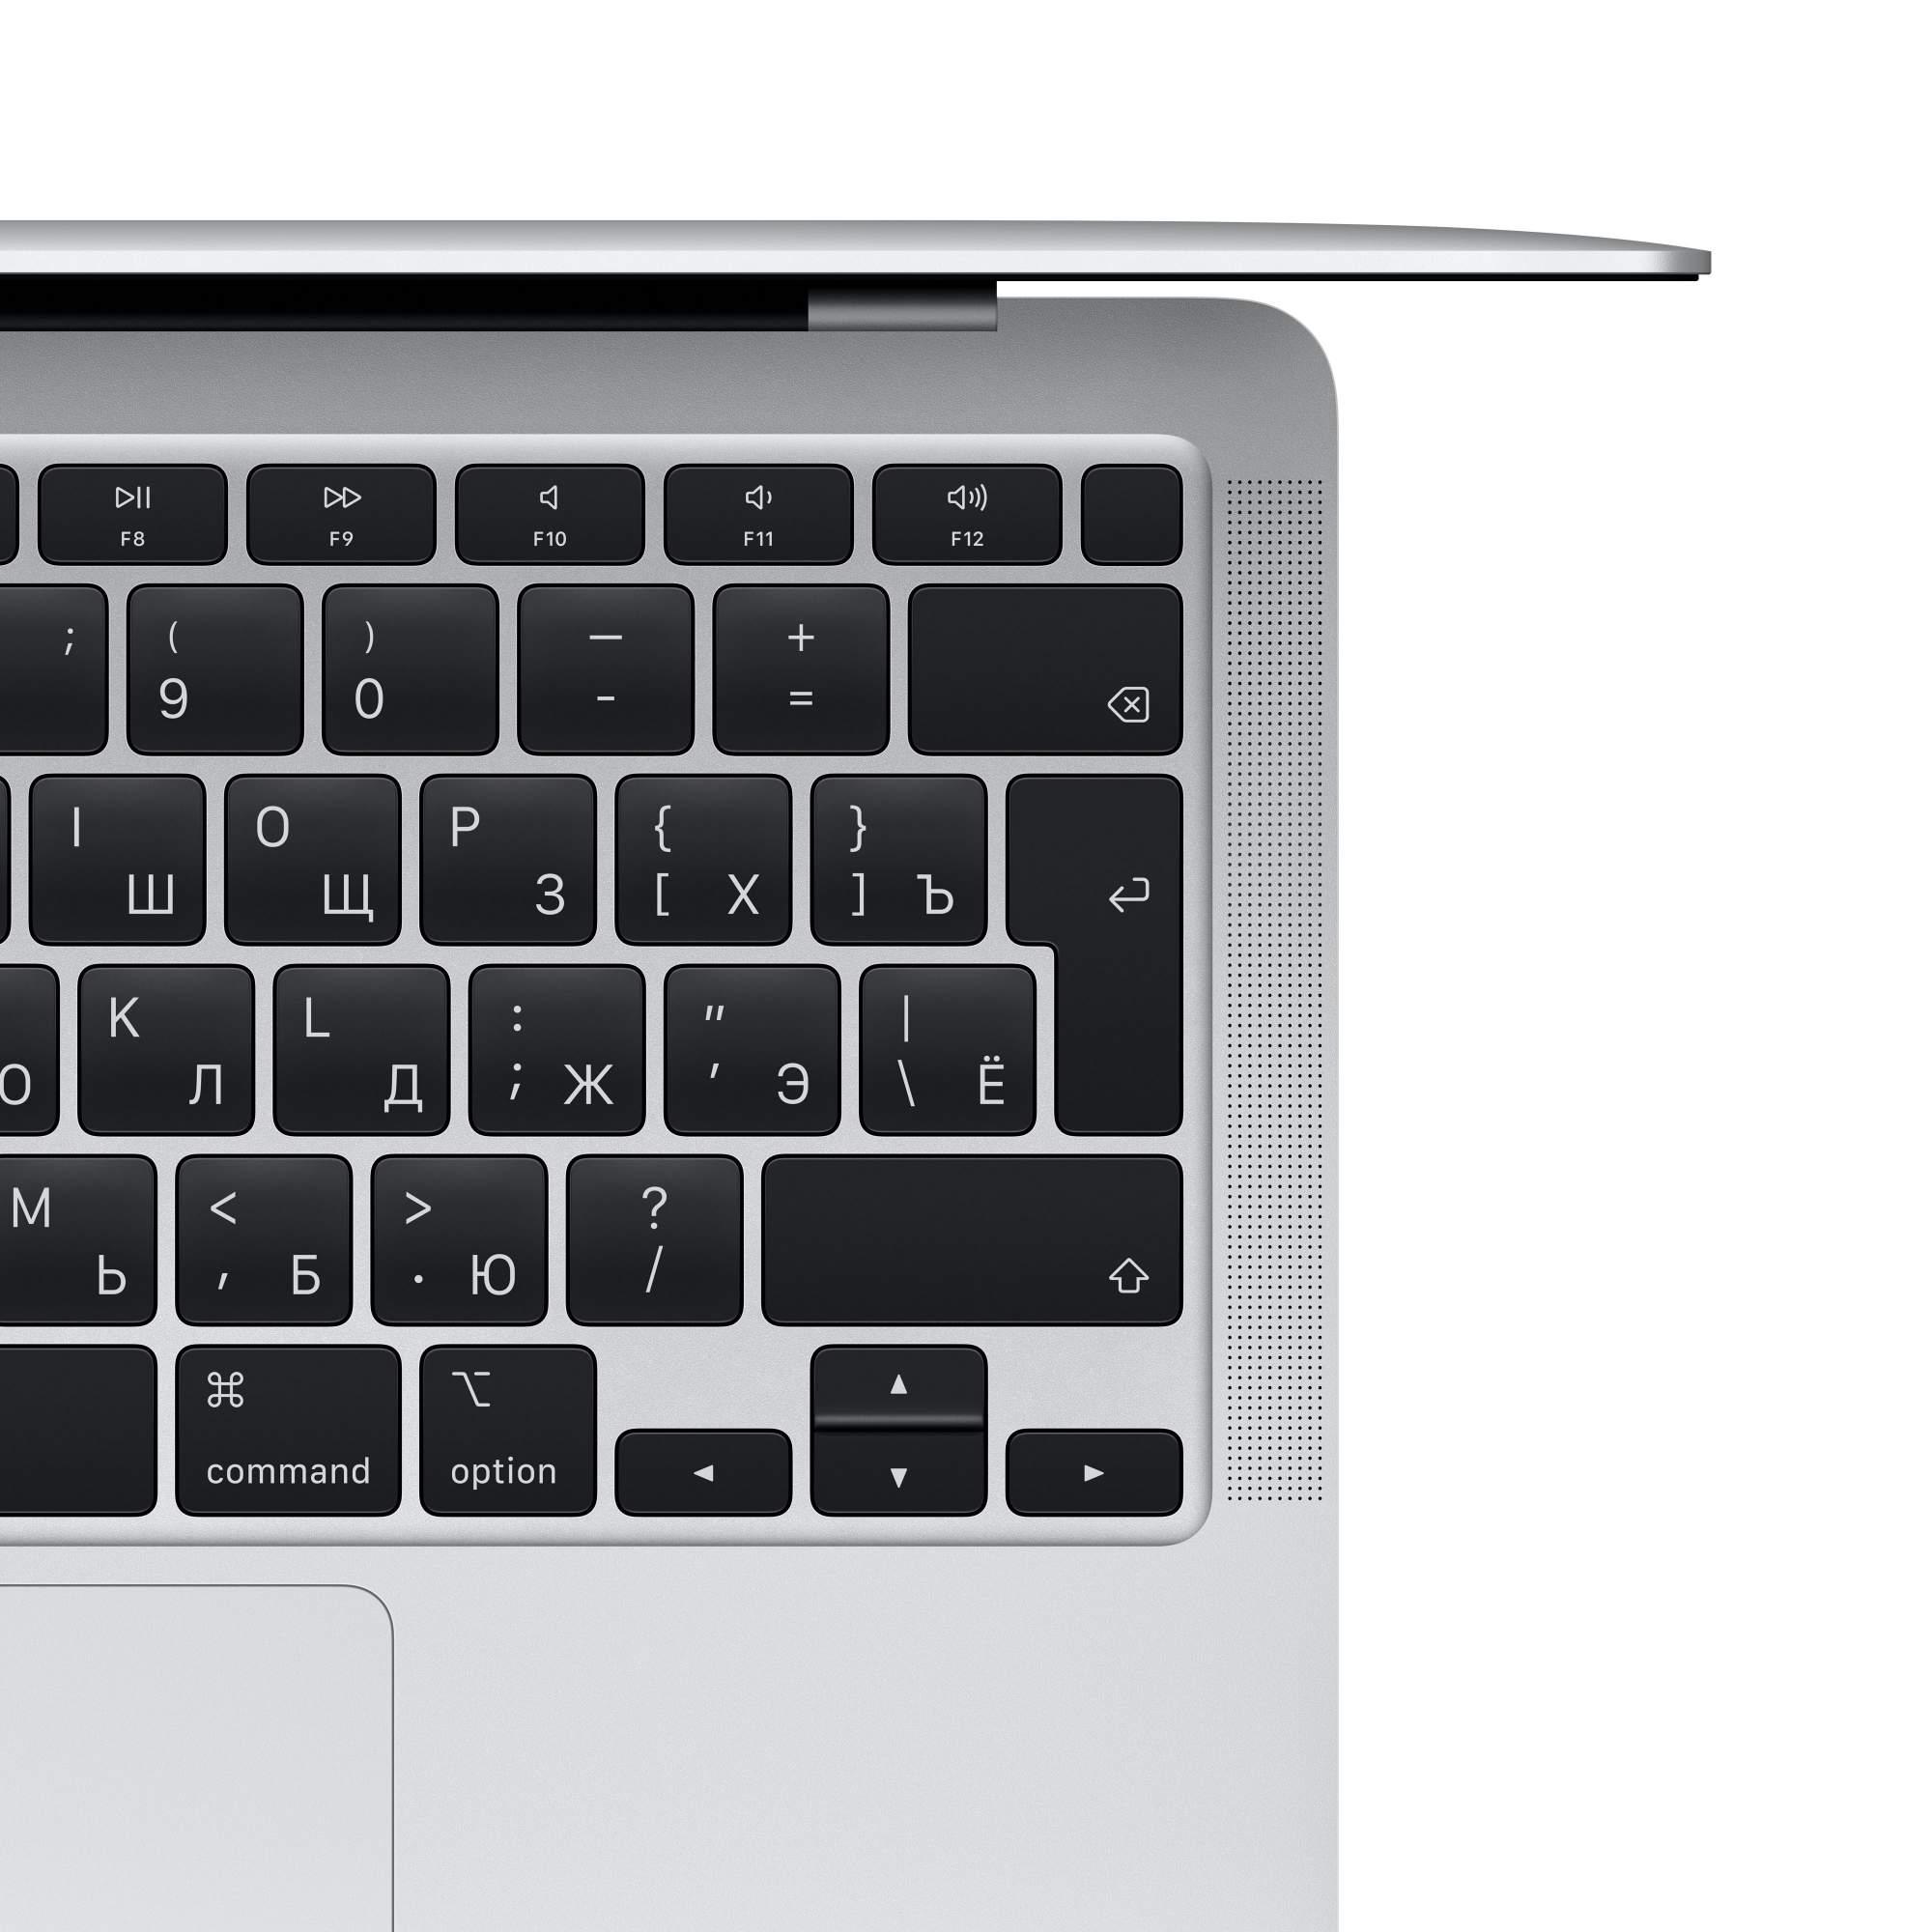 Ноутбук Apple MacBook Air 13 M1 2020 серебристый (MGN93RU-A)